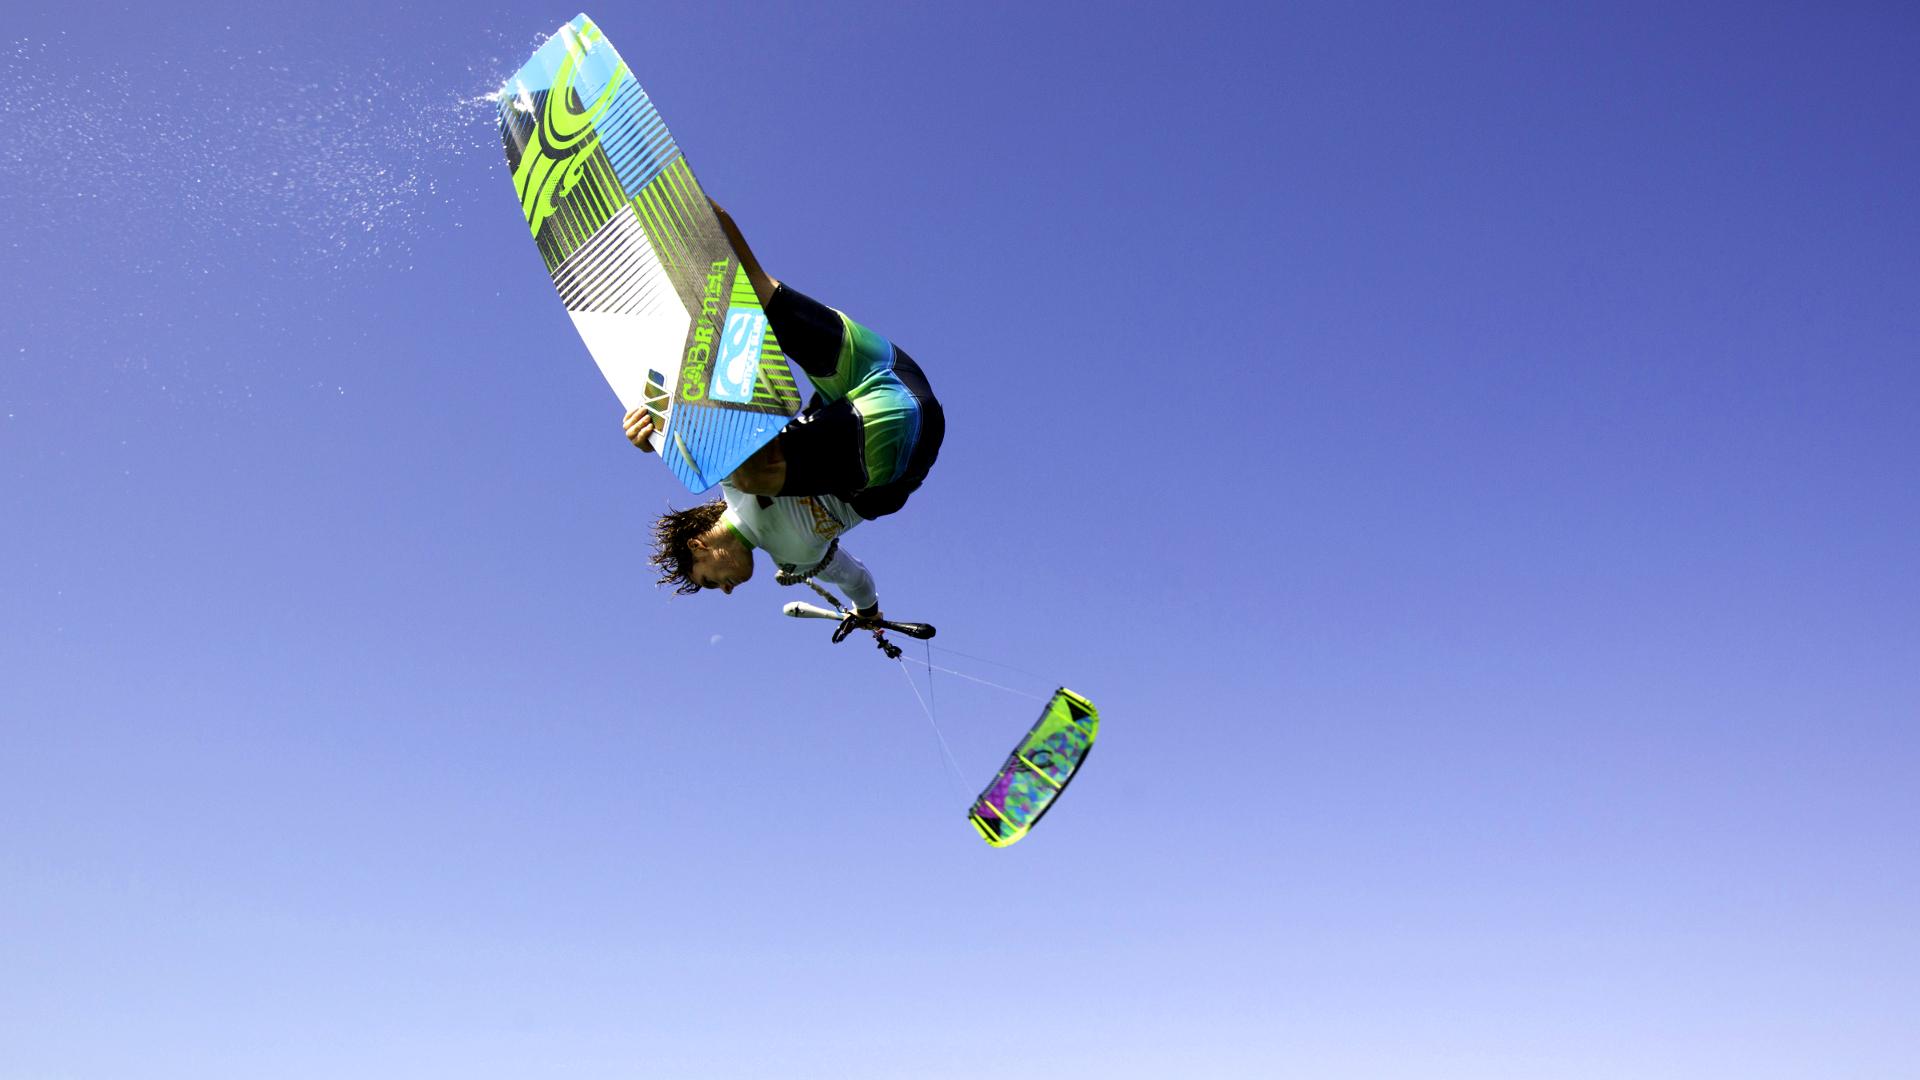 kitesurf wallpaper image - The Cabrinha Chaos kite in action - board grab kitesurfing - in resolution: High Definition - HD 16:9 1920 X 1080